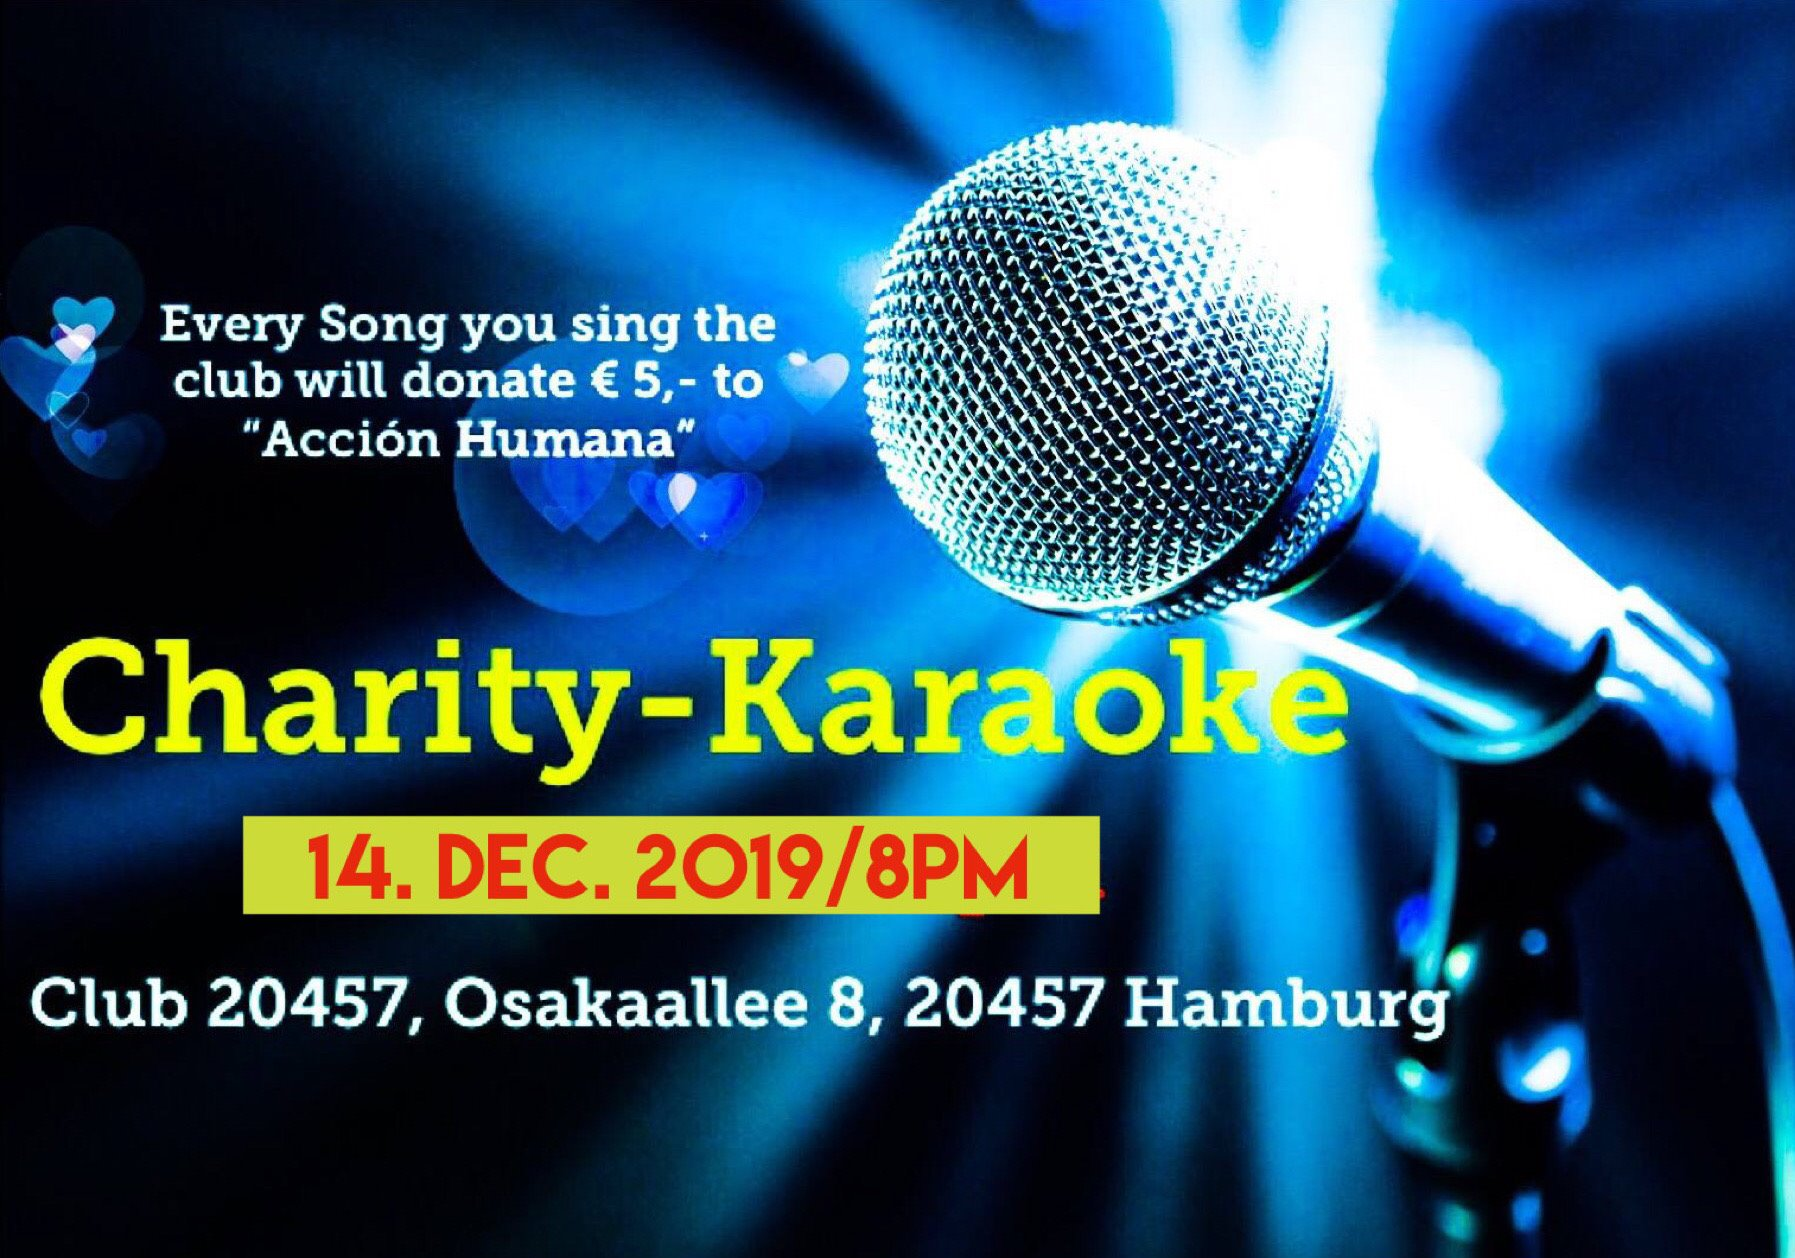 Charity-Karaoke